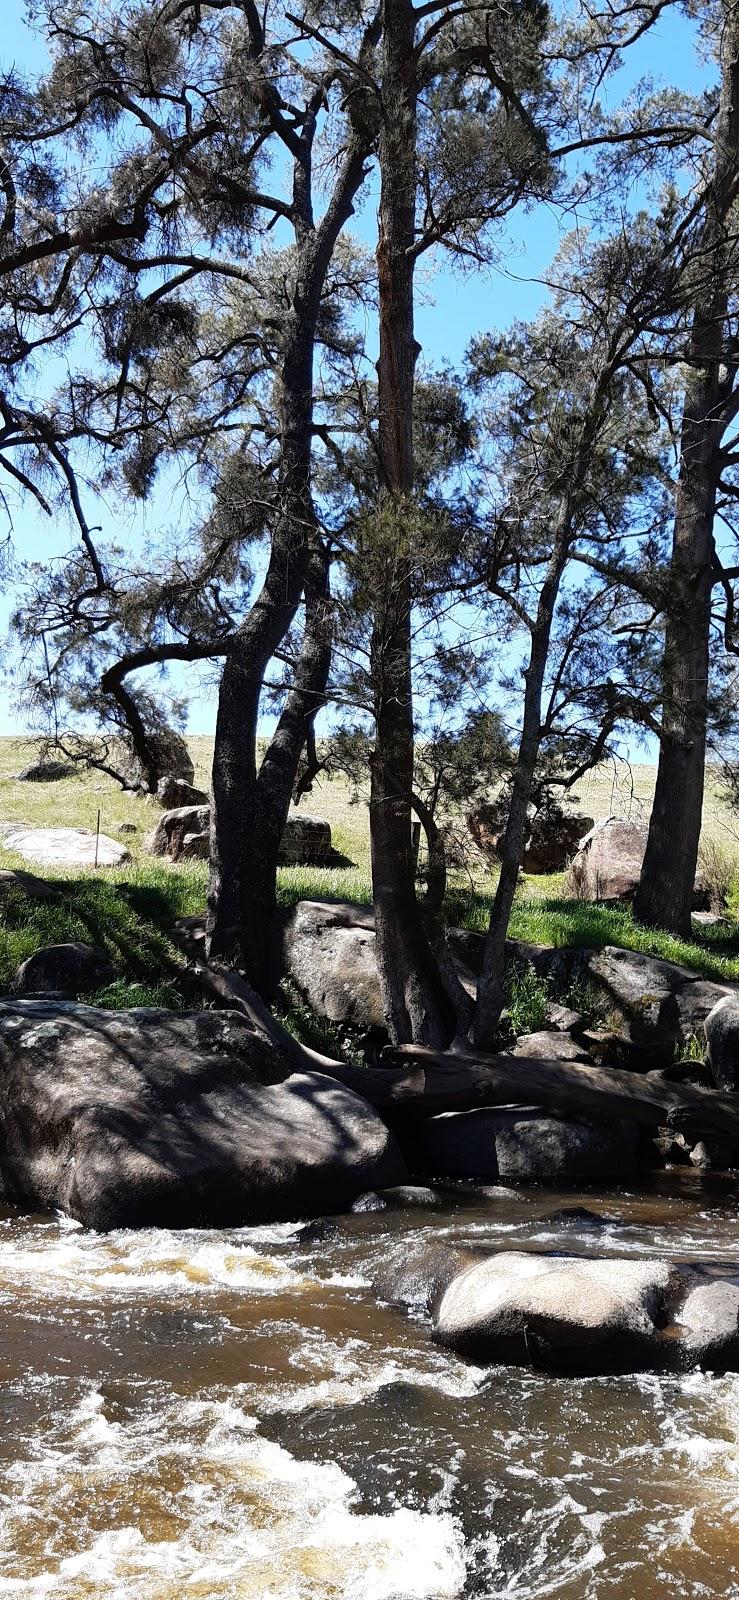 Flat Rock Picnic Area   point of interest   Mutton Falls Rd, OConnell NSW 2795, Australia